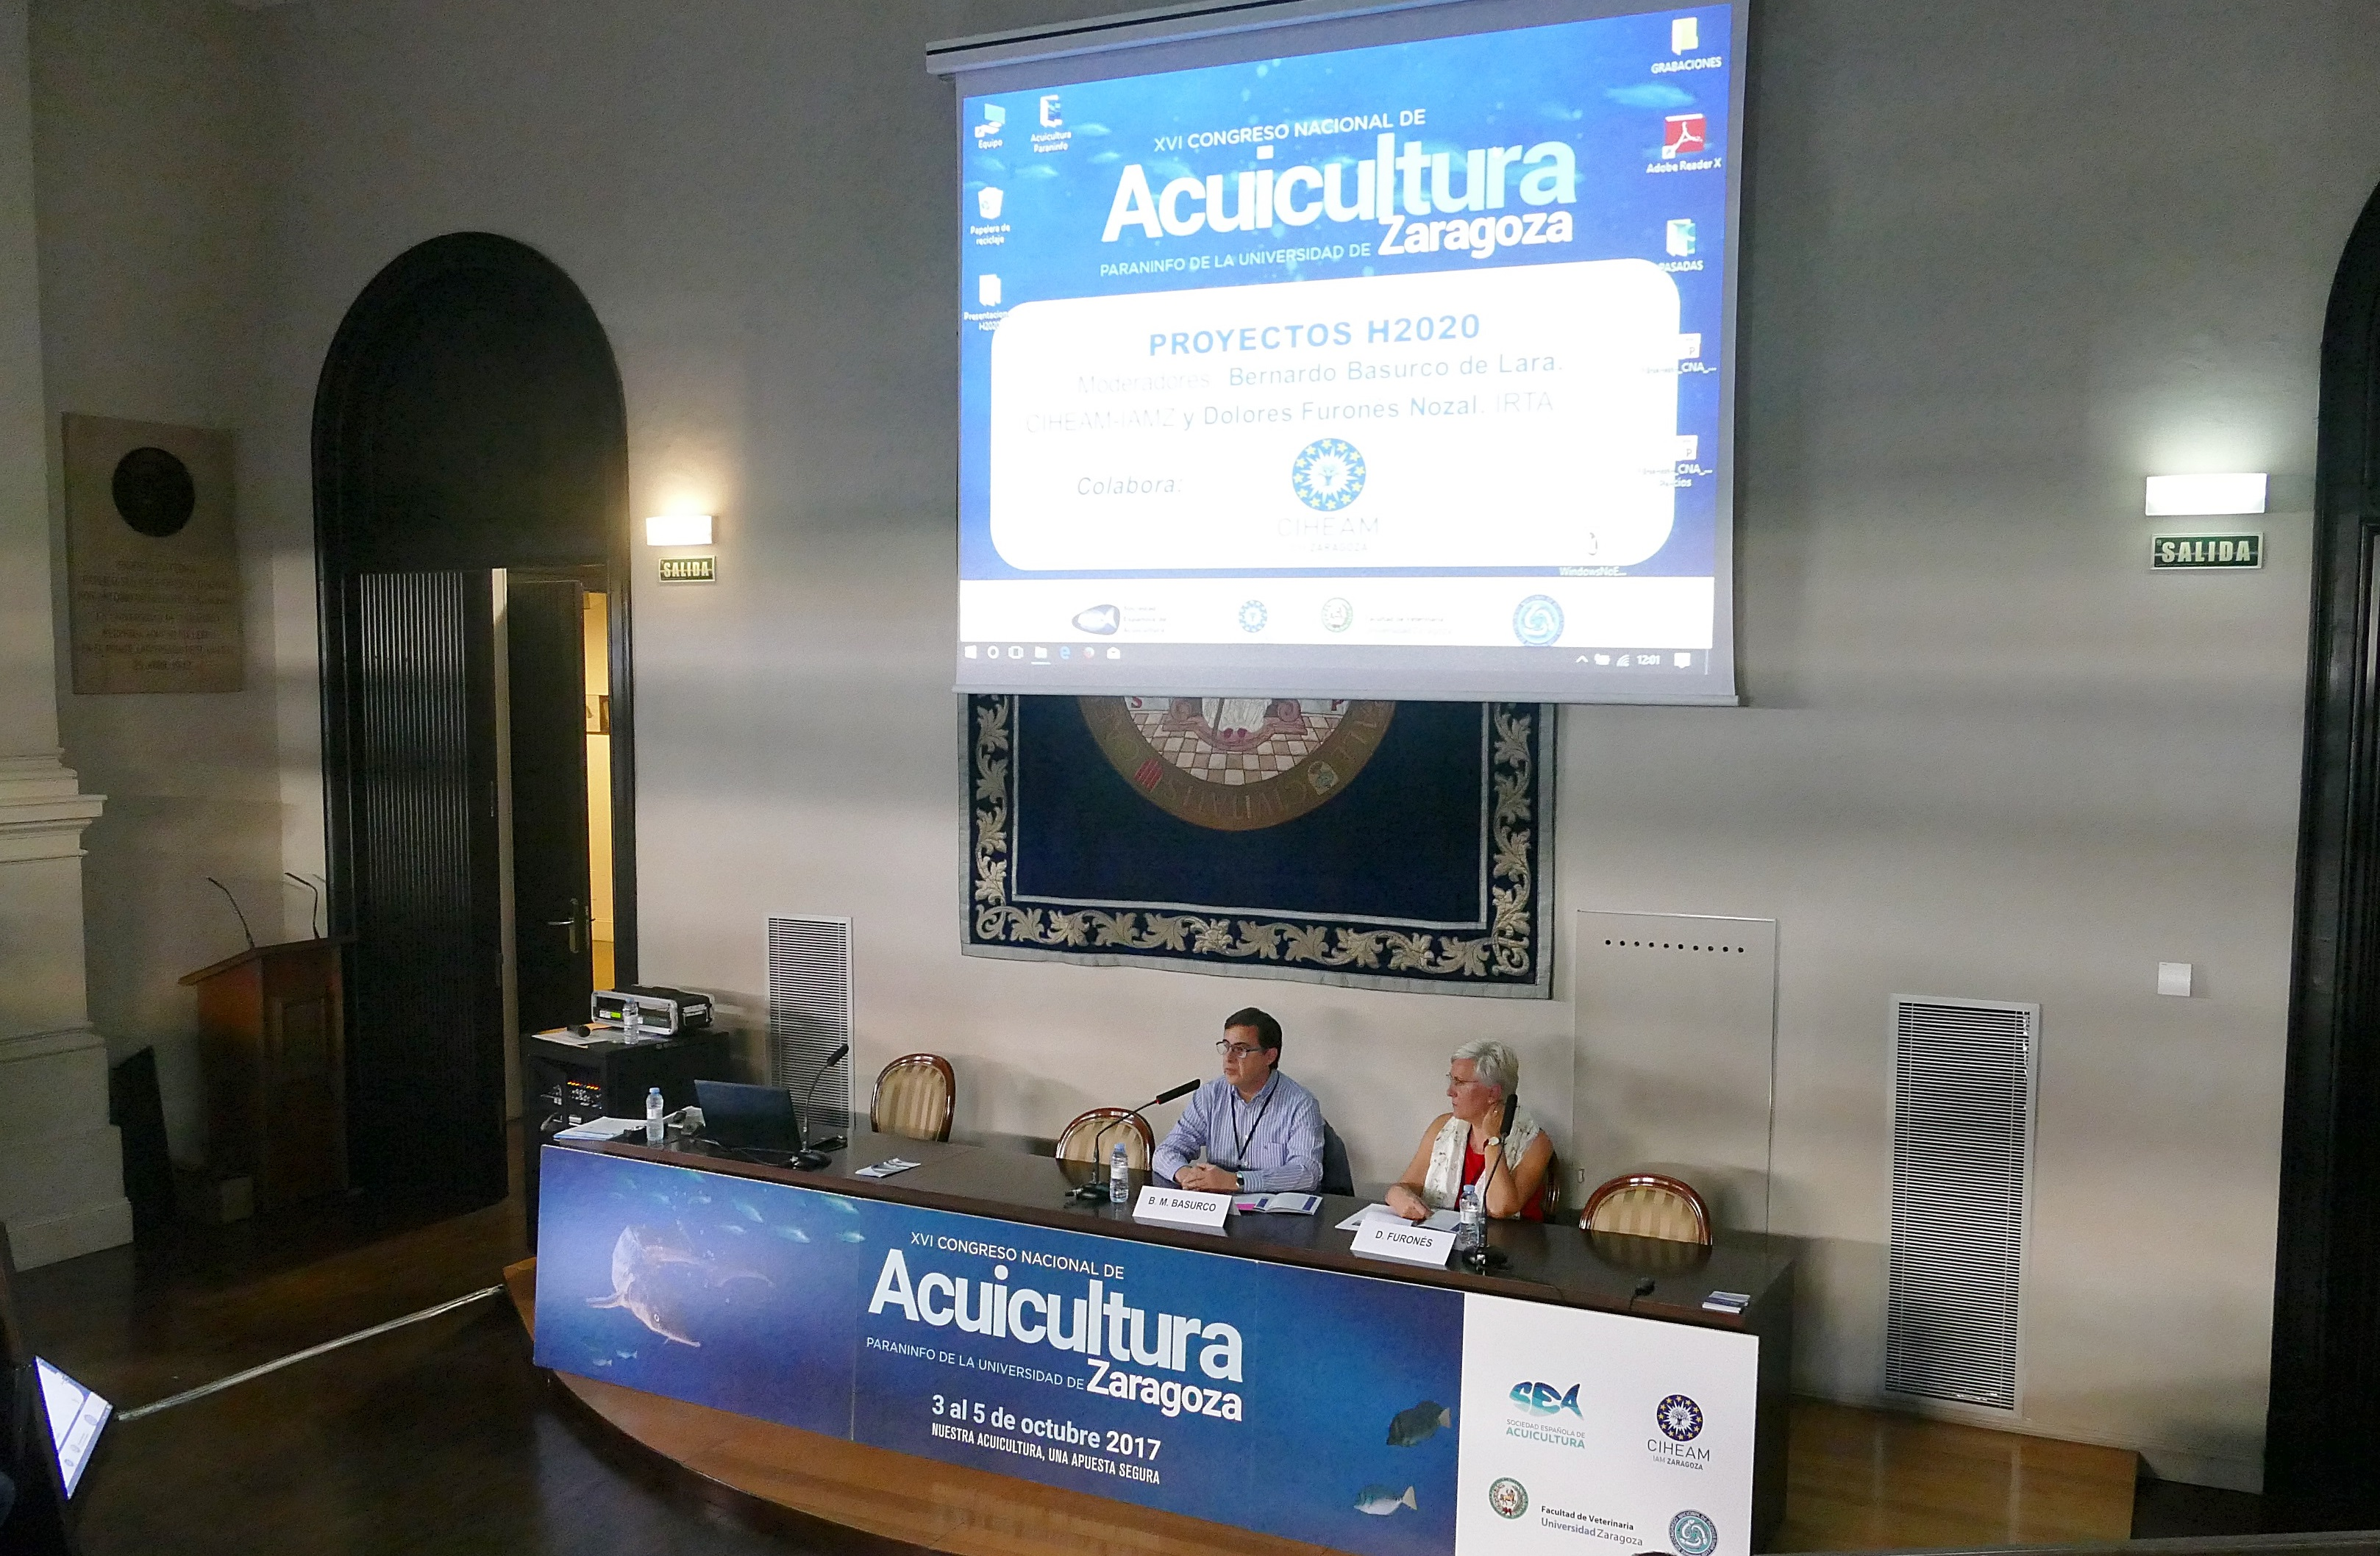 CongresoAcuicultura (2)